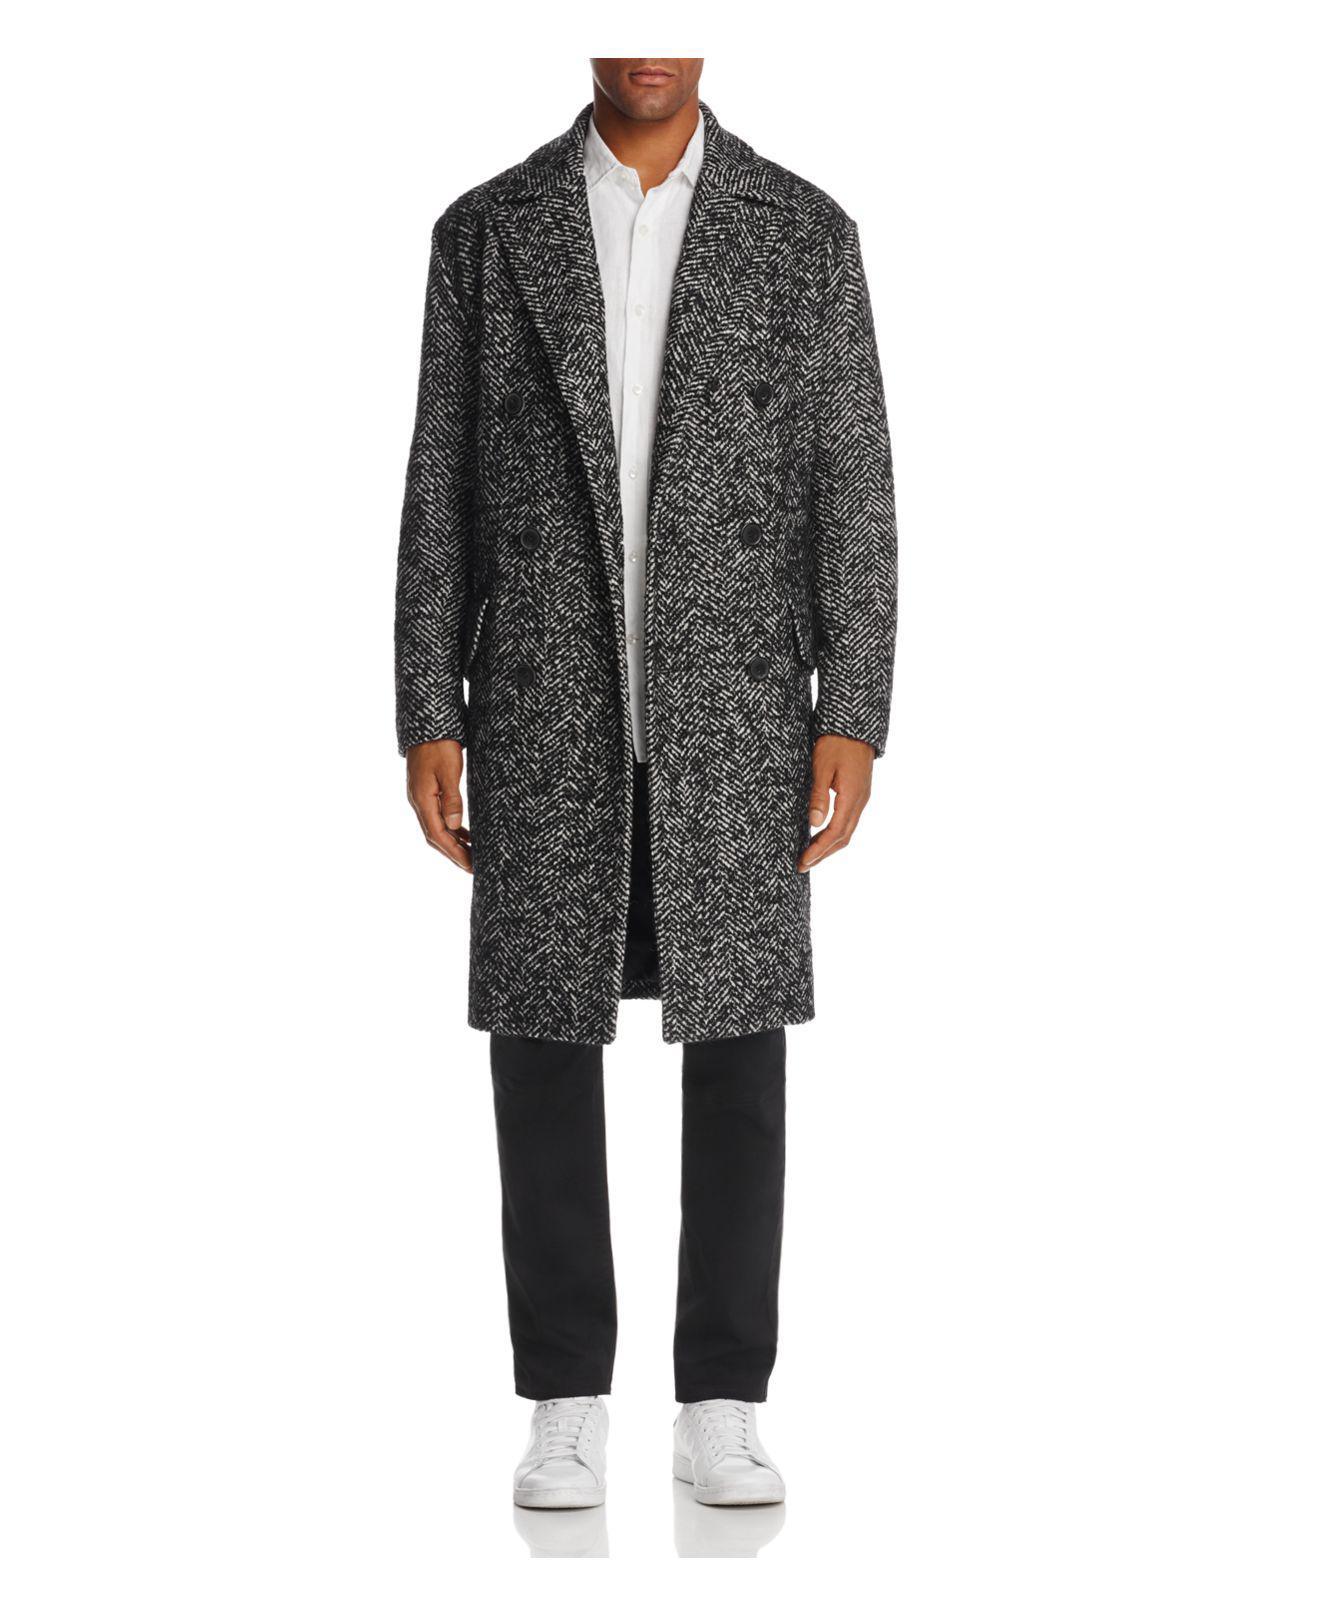 Theory. Men's Black Oversized & Double-breasted Herringbone Coat